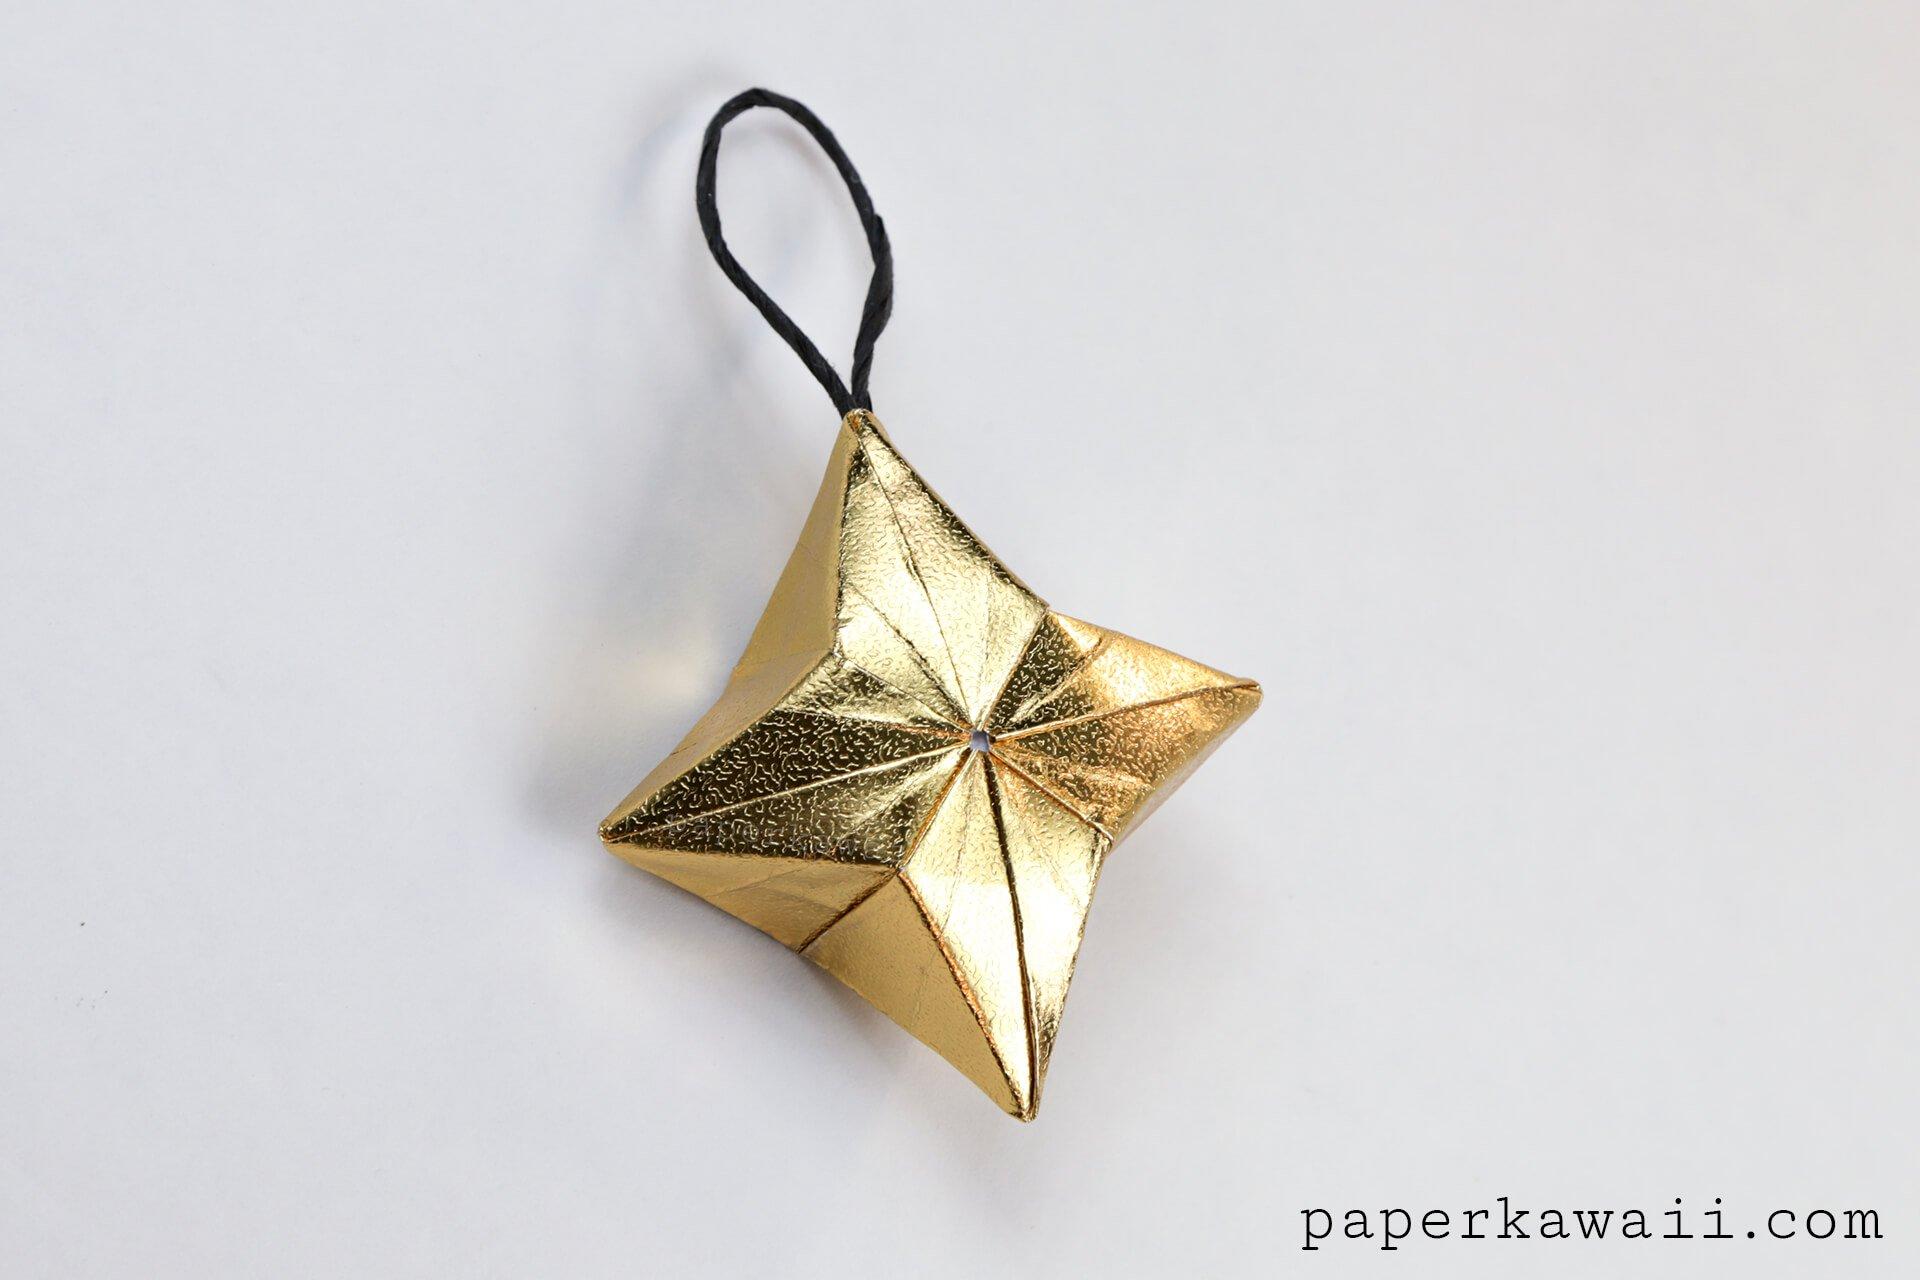 3d Origami Puffy Star Tutorial Paper Kawaii Christmas Ornaments On A Diagram Via